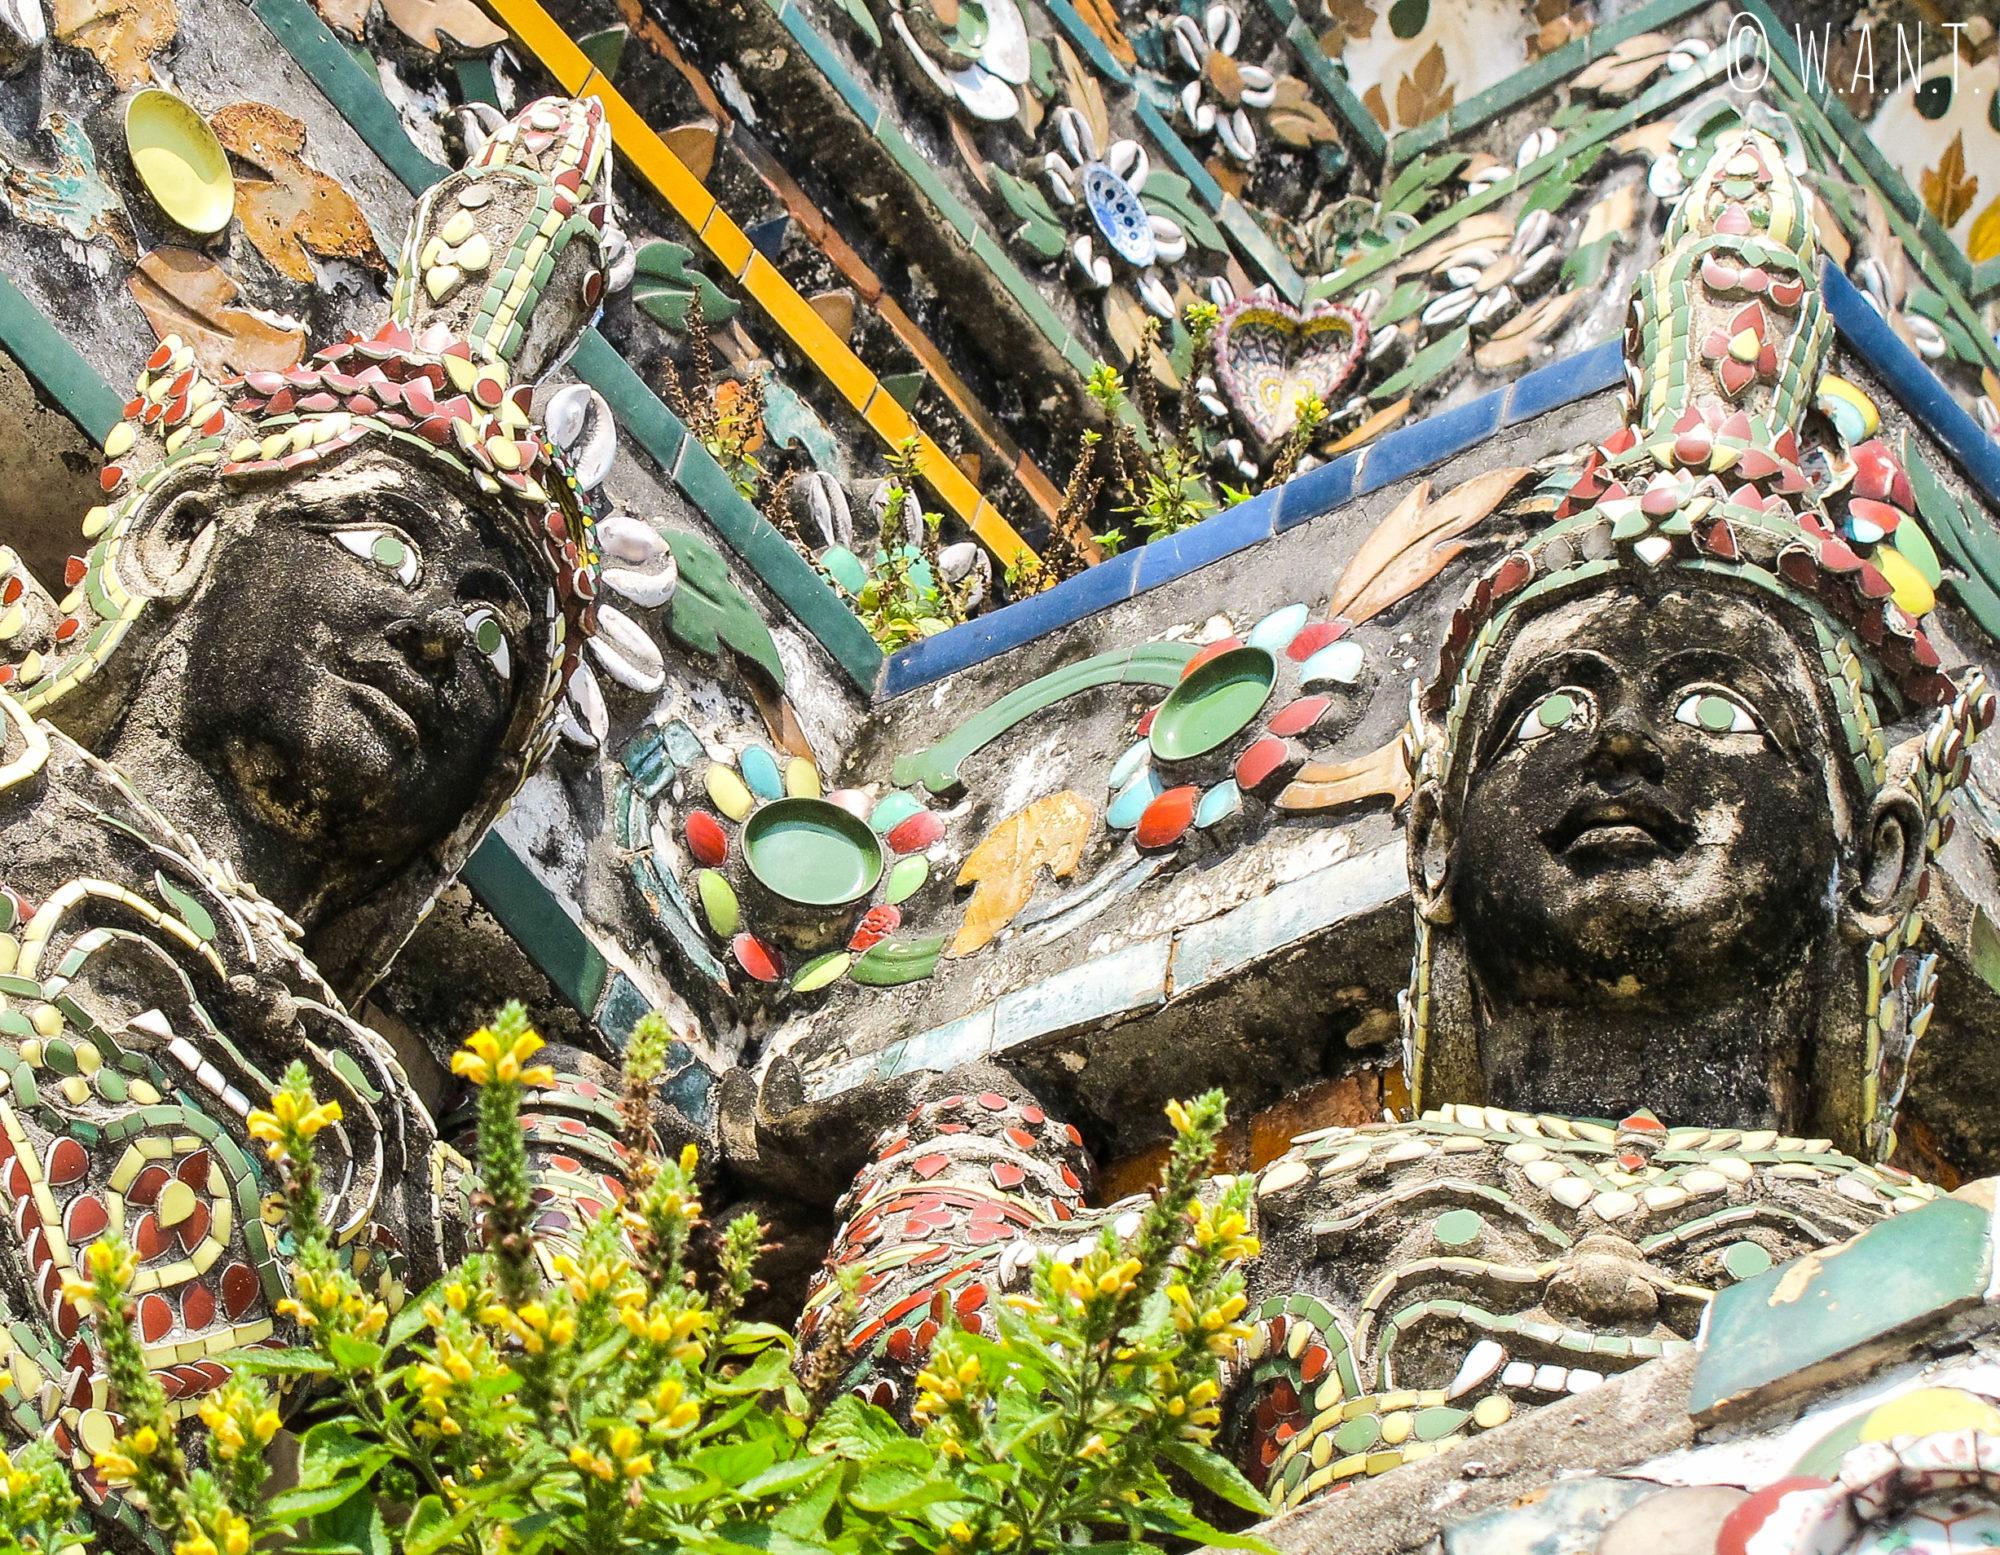 Décor du Wat Arun de Bangkok avant les rénovations